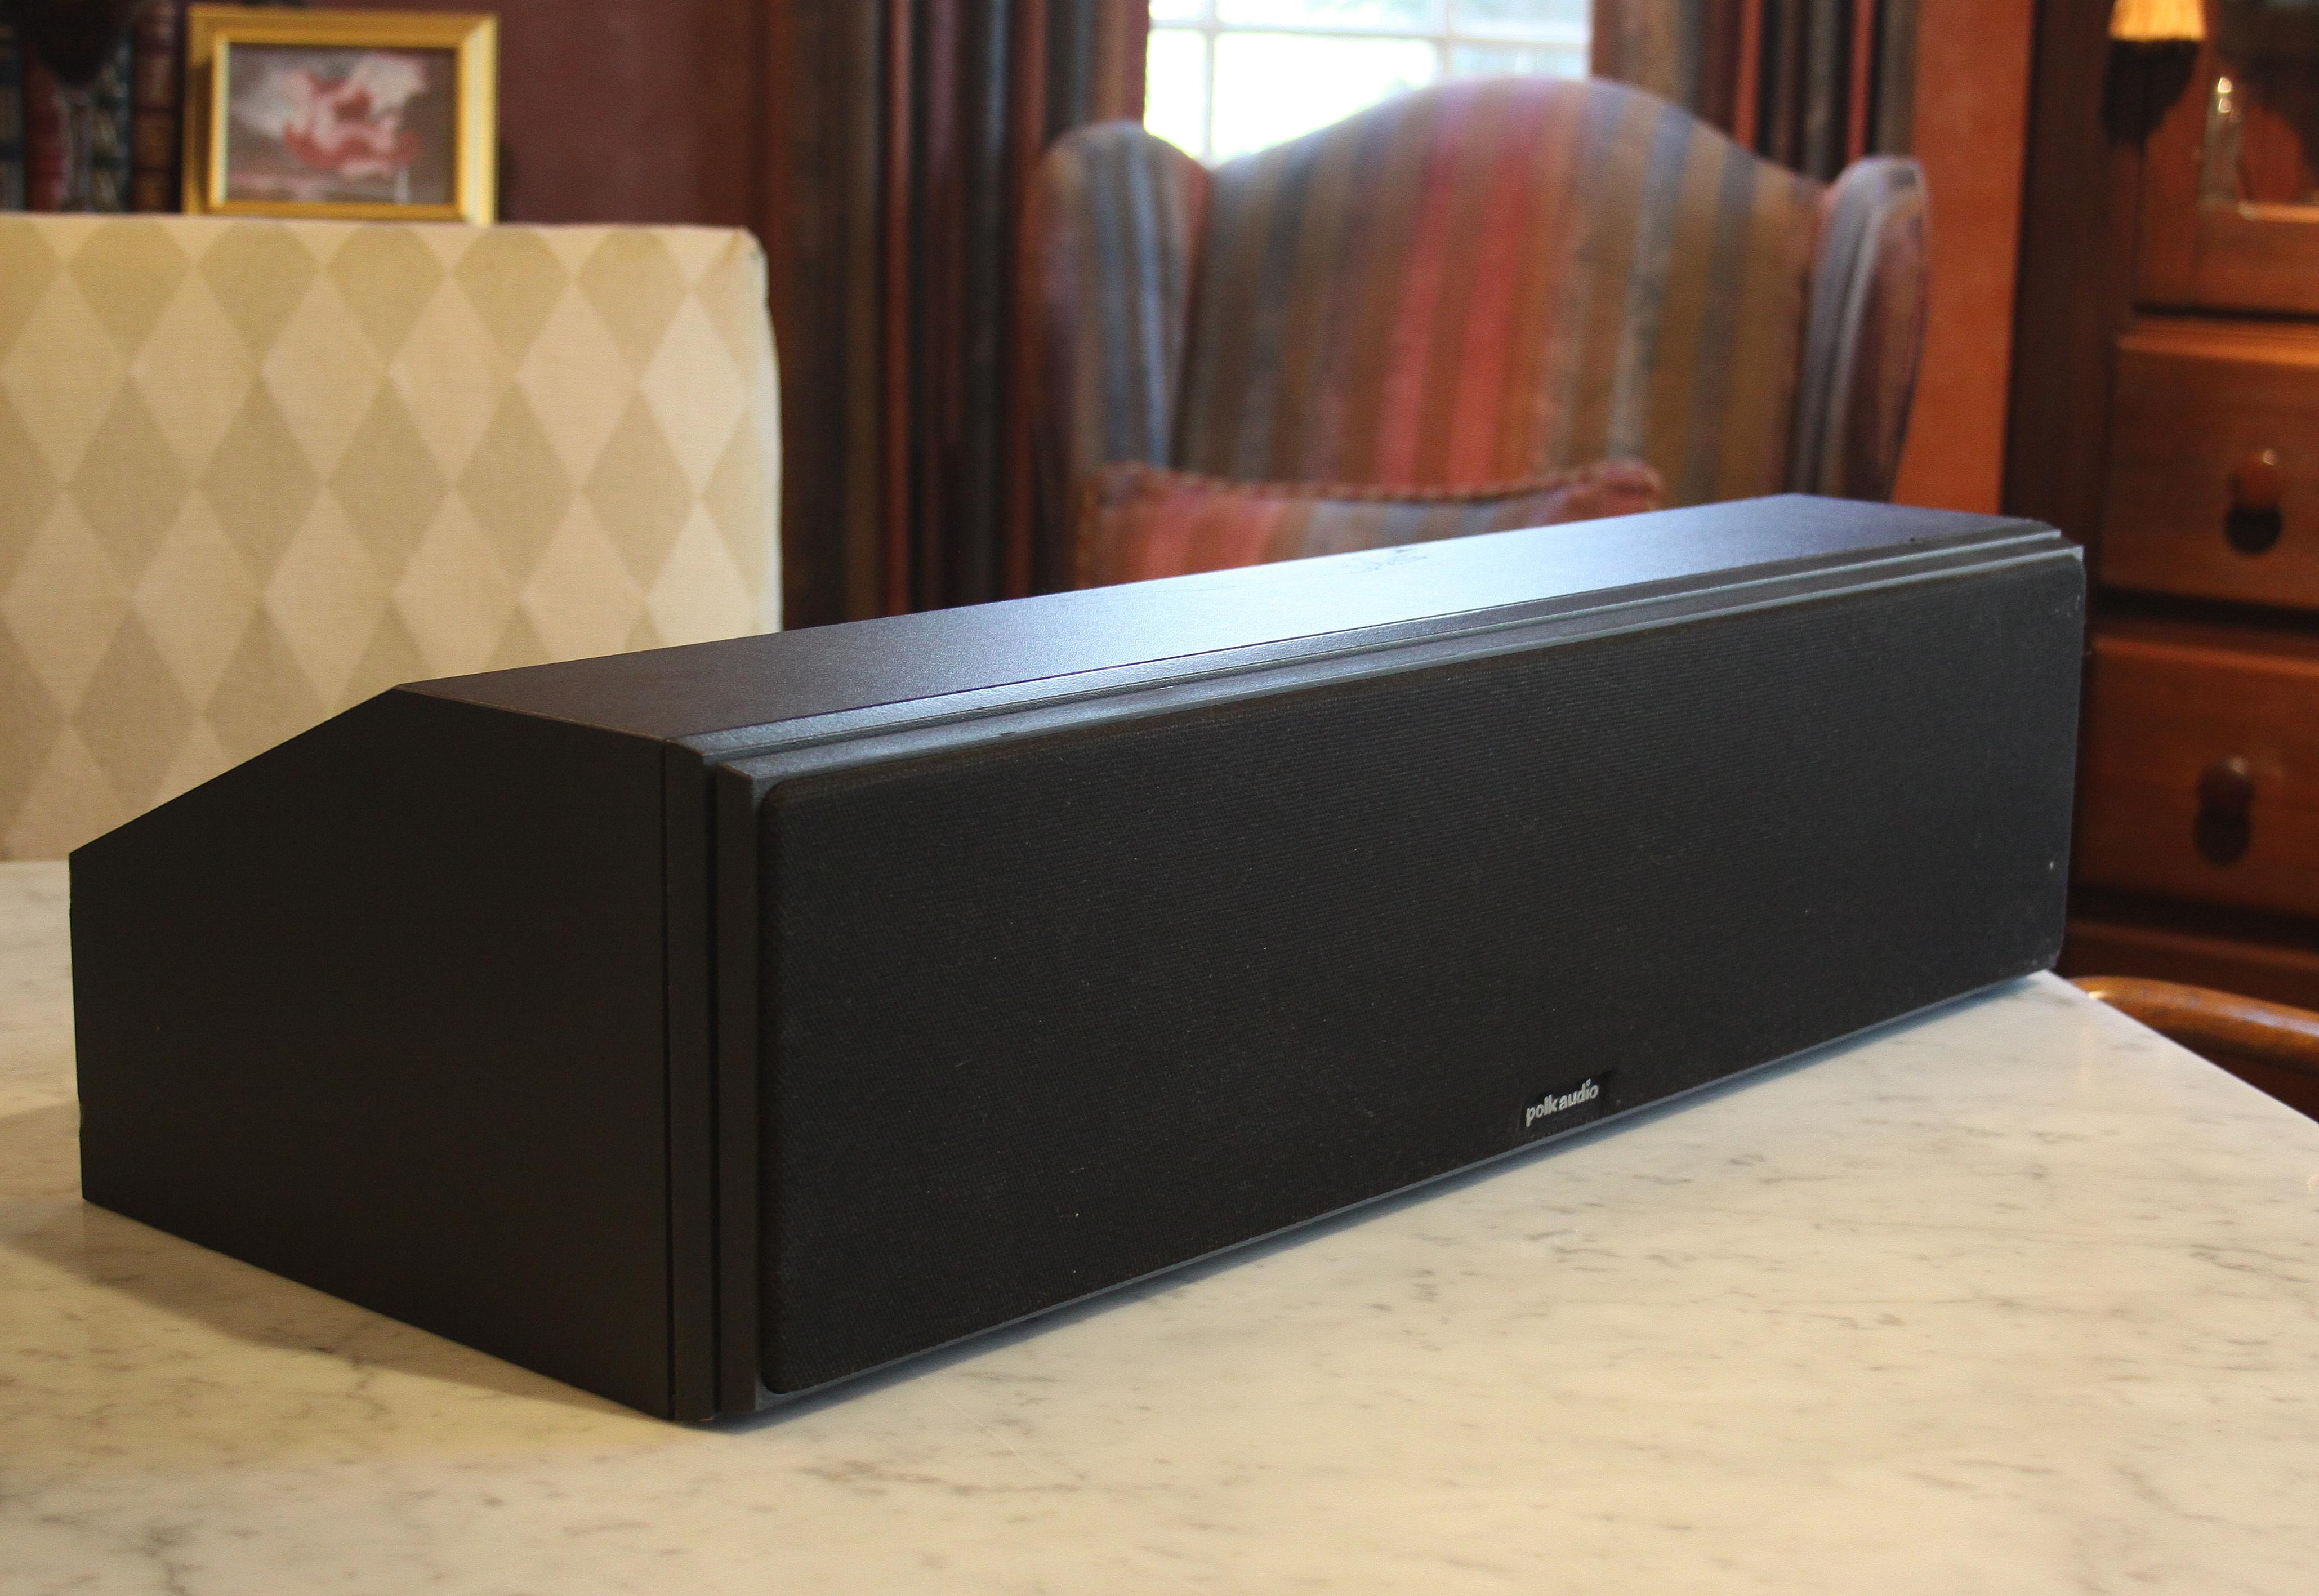 fs polk cs350 ls center speaker polk audio. Black Bedroom Furniture Sets. Home Design Ideas